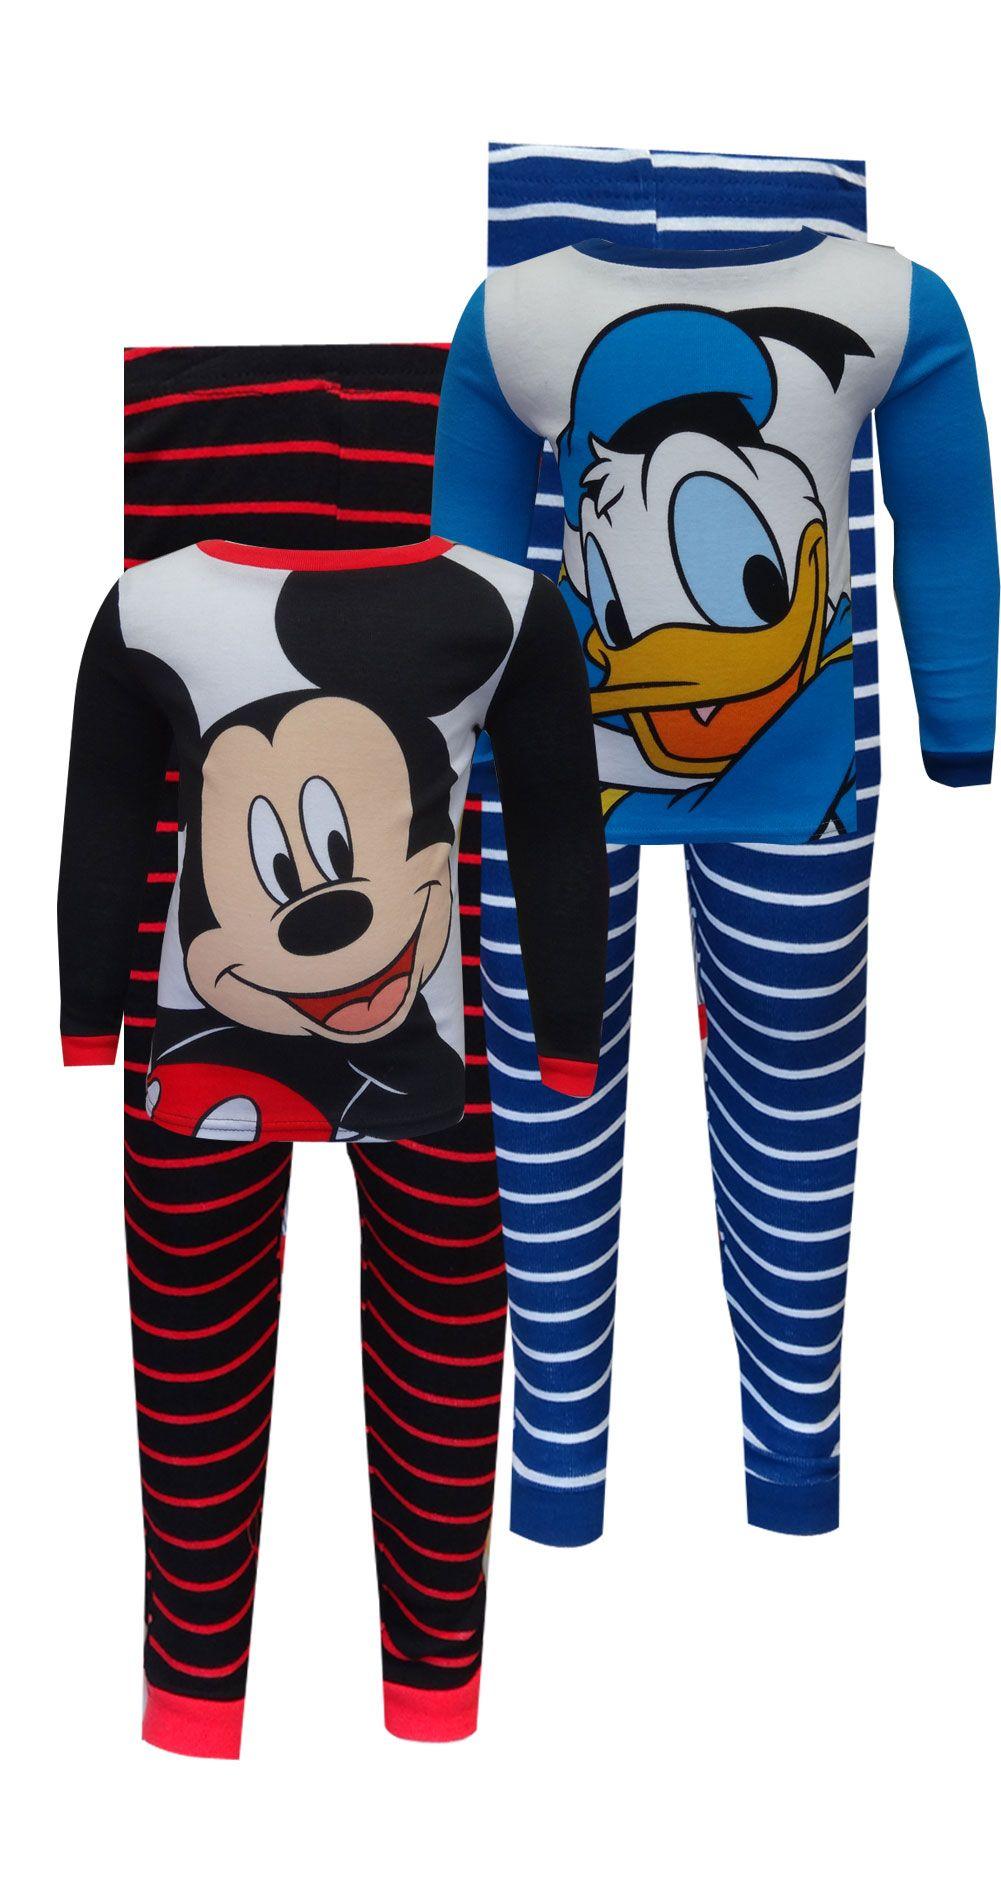 Boys Kids Donald Duck,Pyjamas Shorts Nightwear,1.5-3Years Birthday Gift